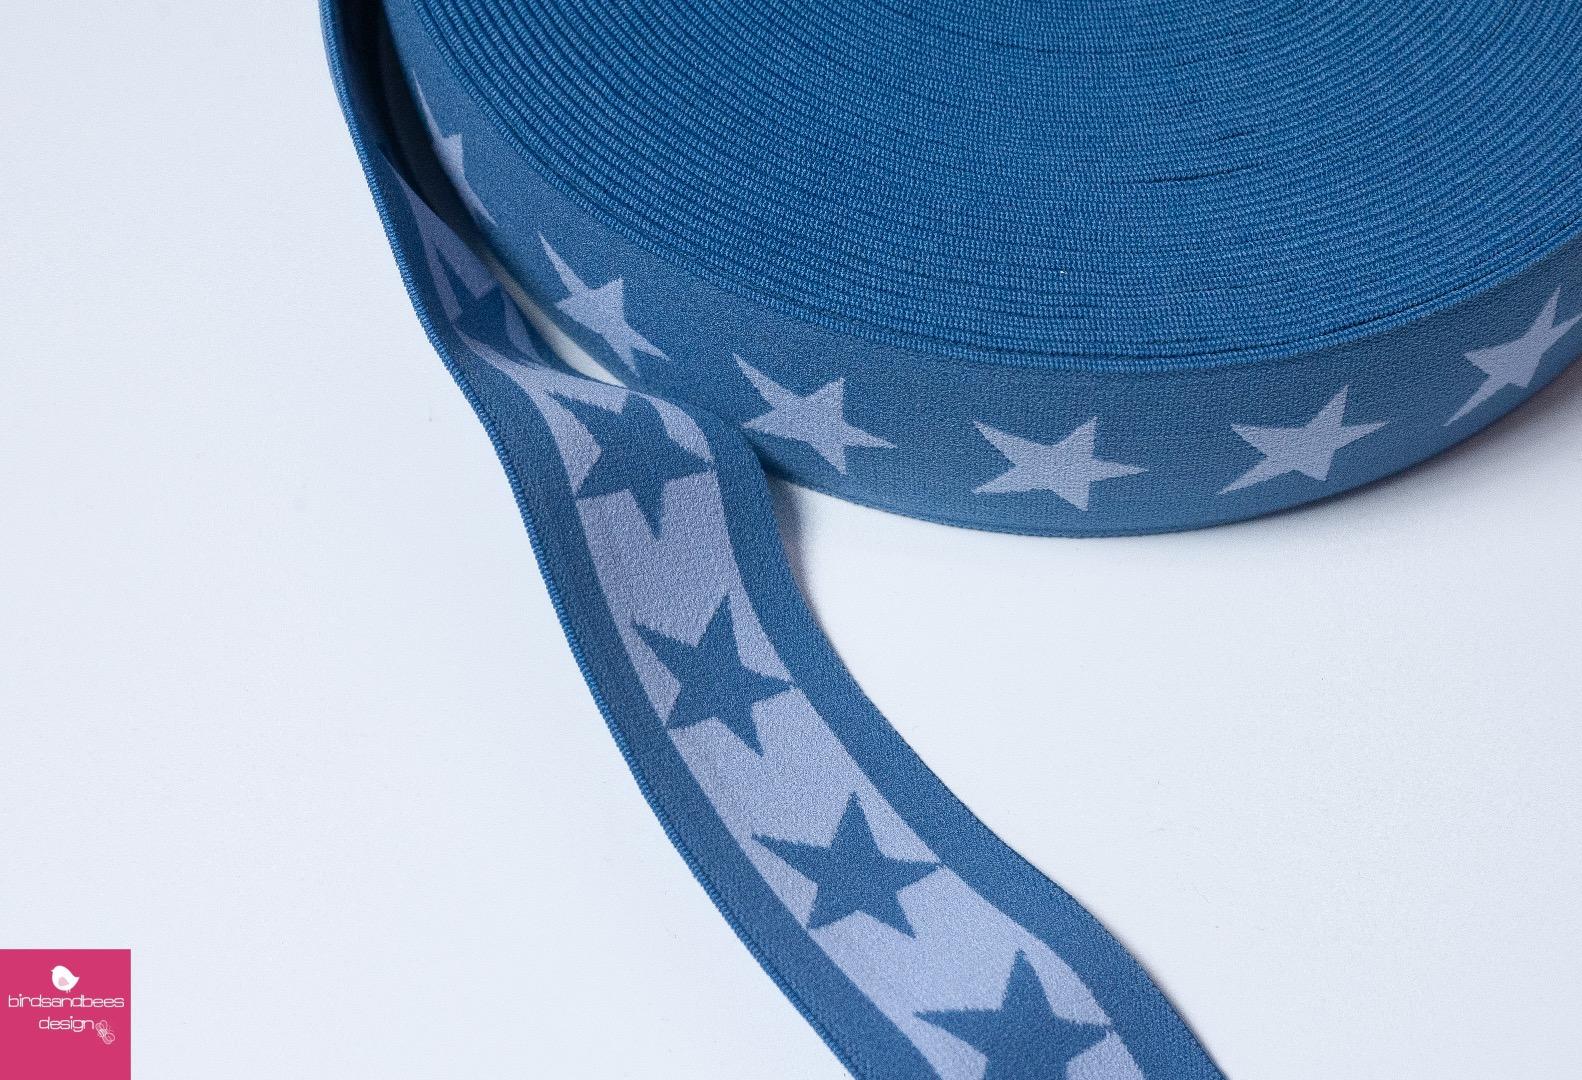 Gummiband Stern 1m 40mm Blau Hellblau